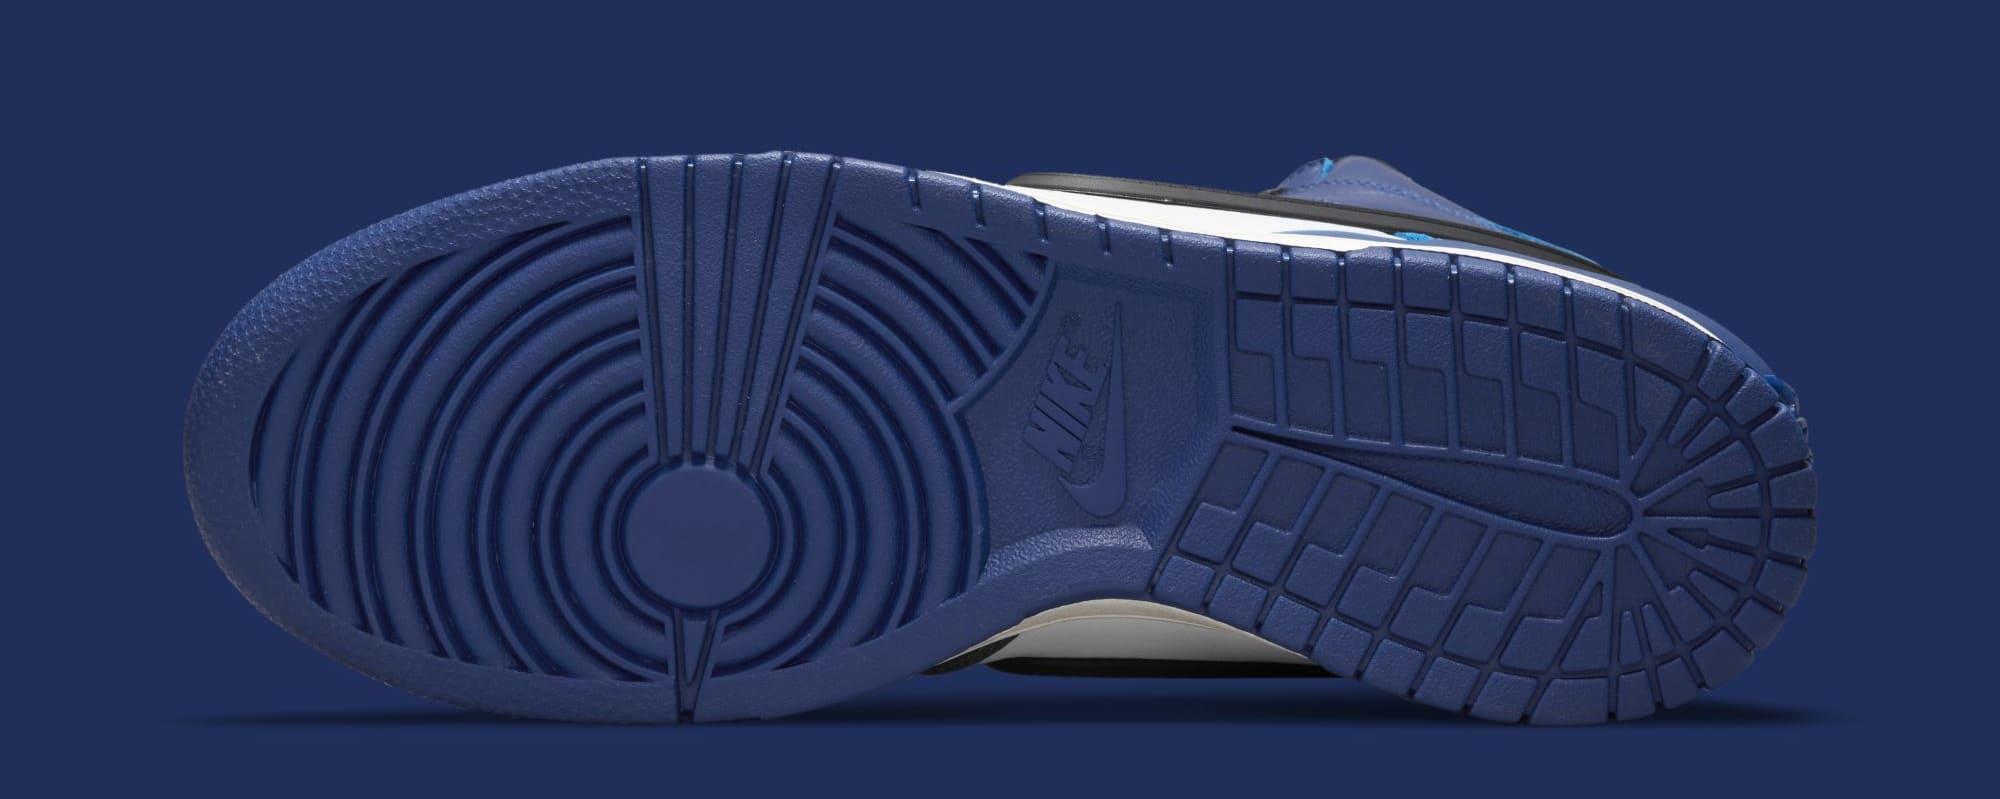 Ambush x Nike Dunk High 'Deep Royal Blue' CU7544-400 (Sole)